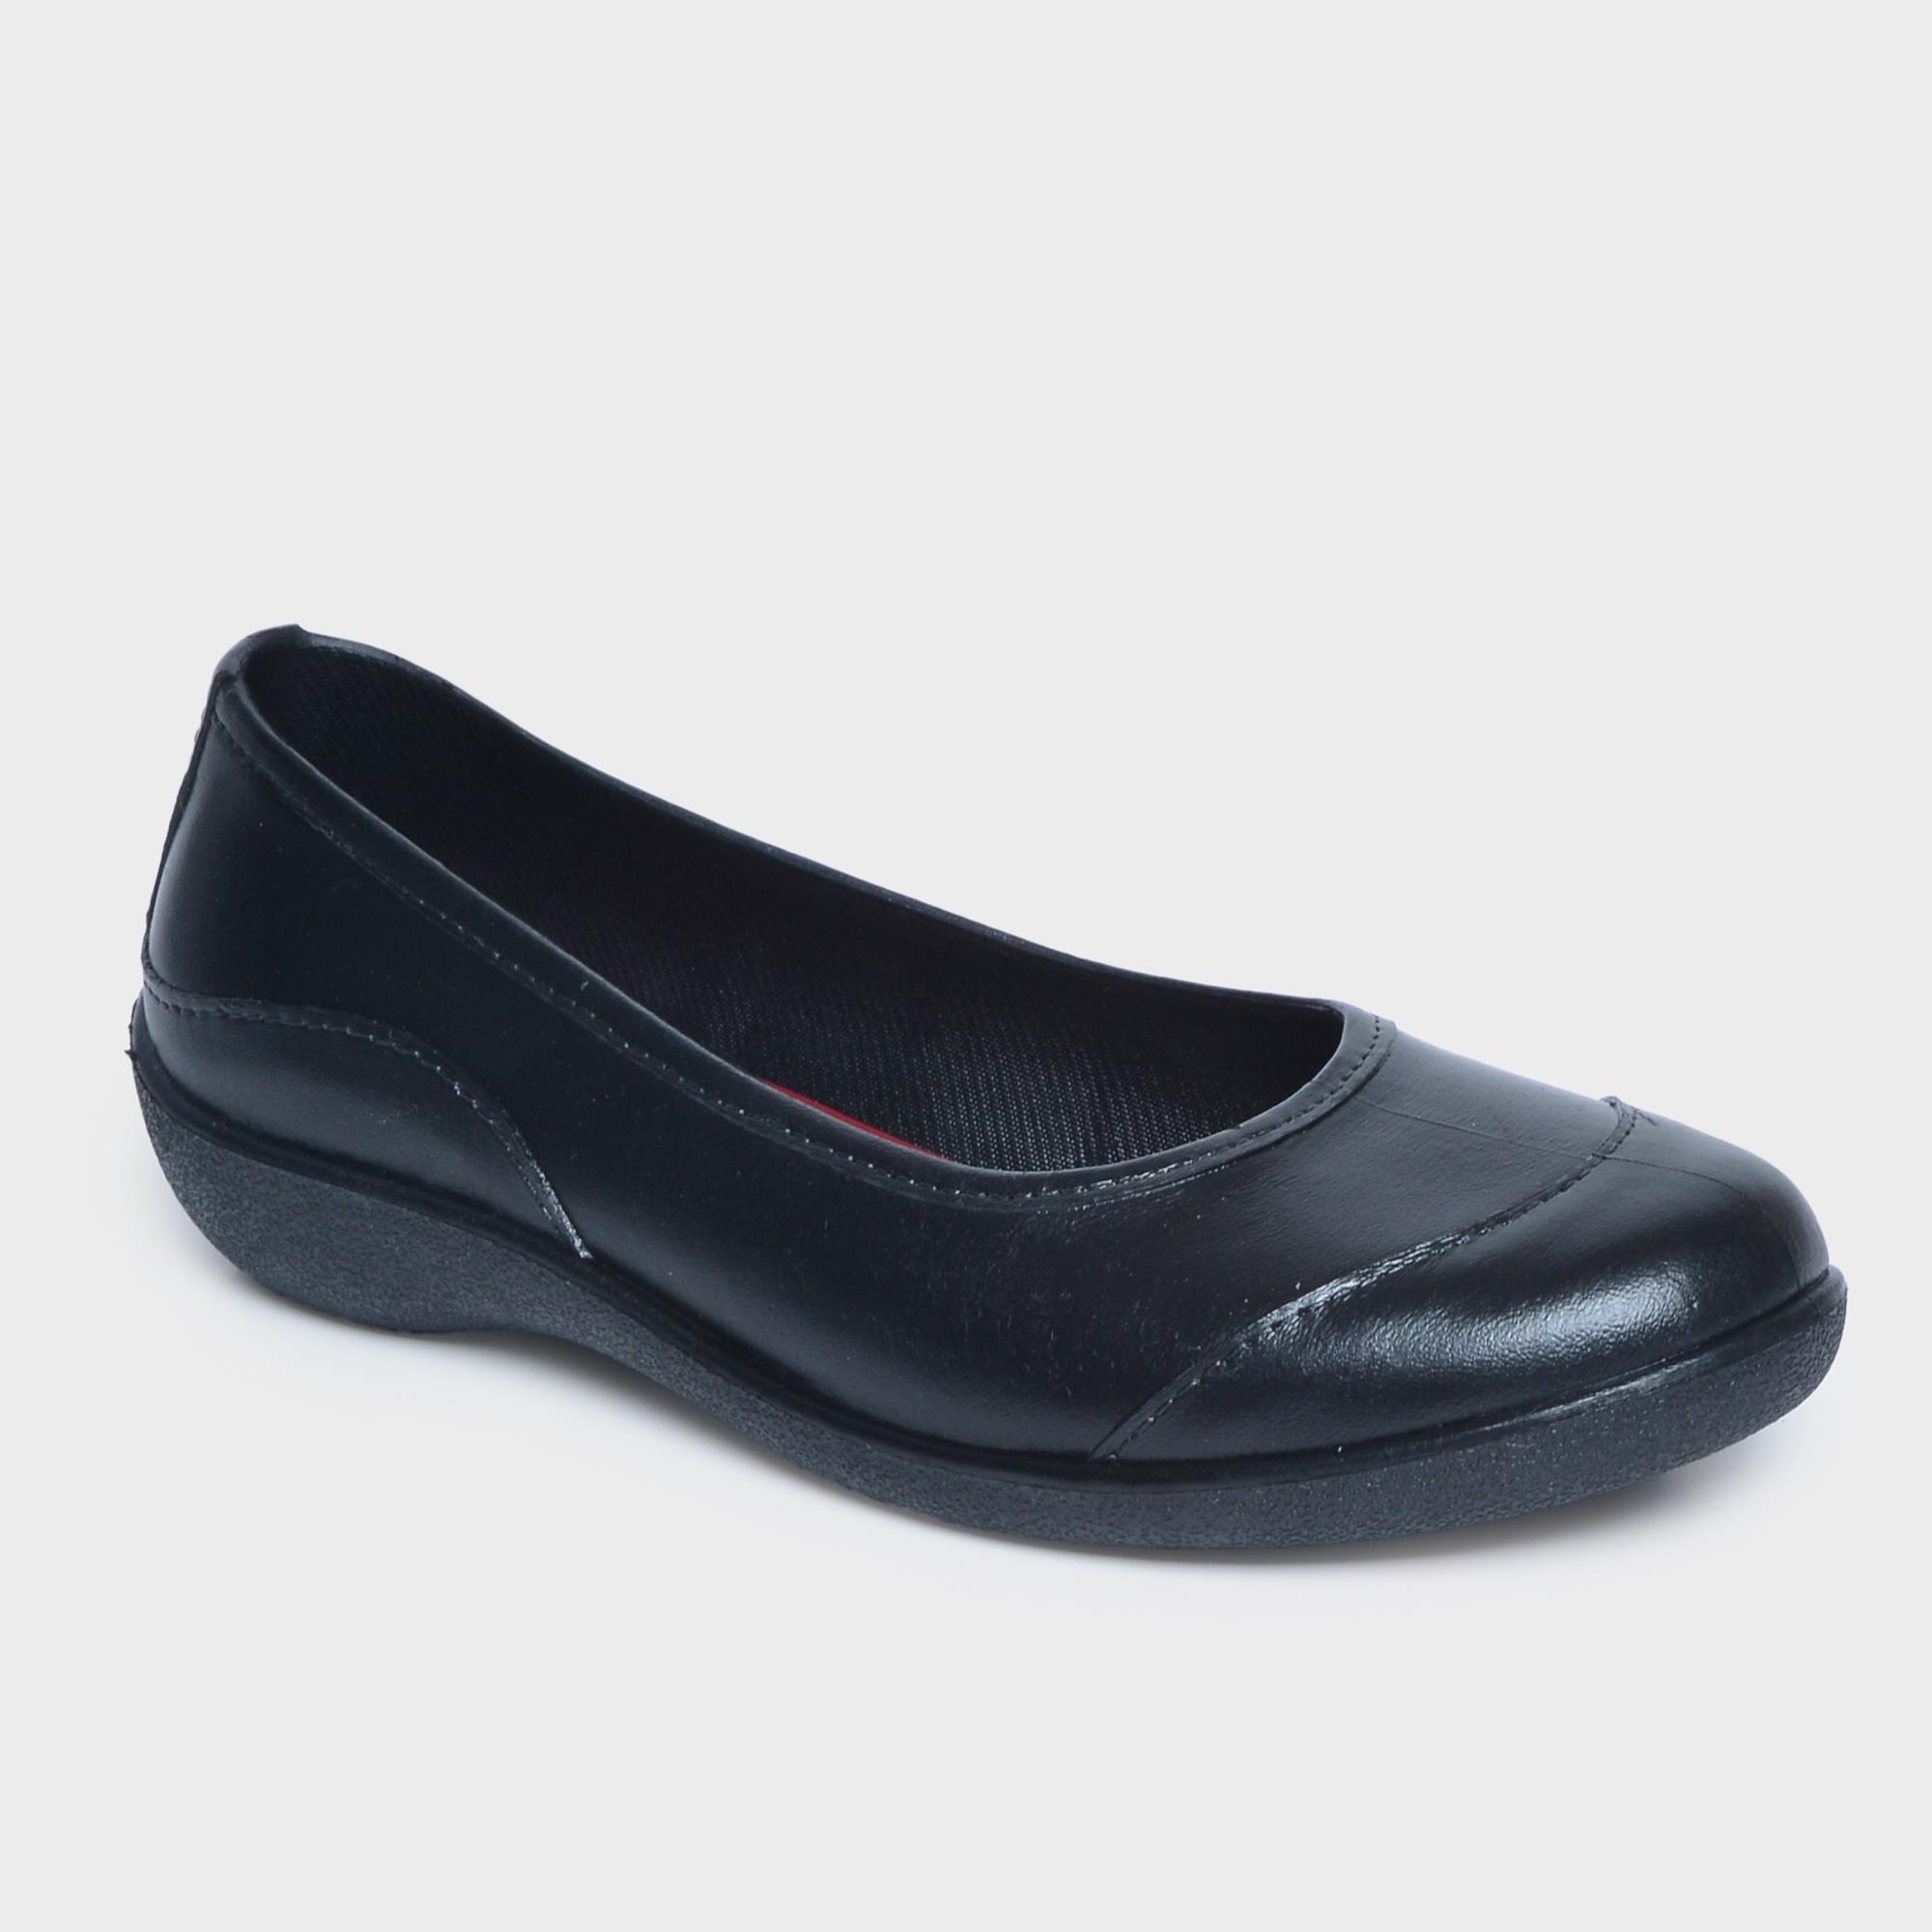 World Balance Shoes Price List New Balance Store Return Policy